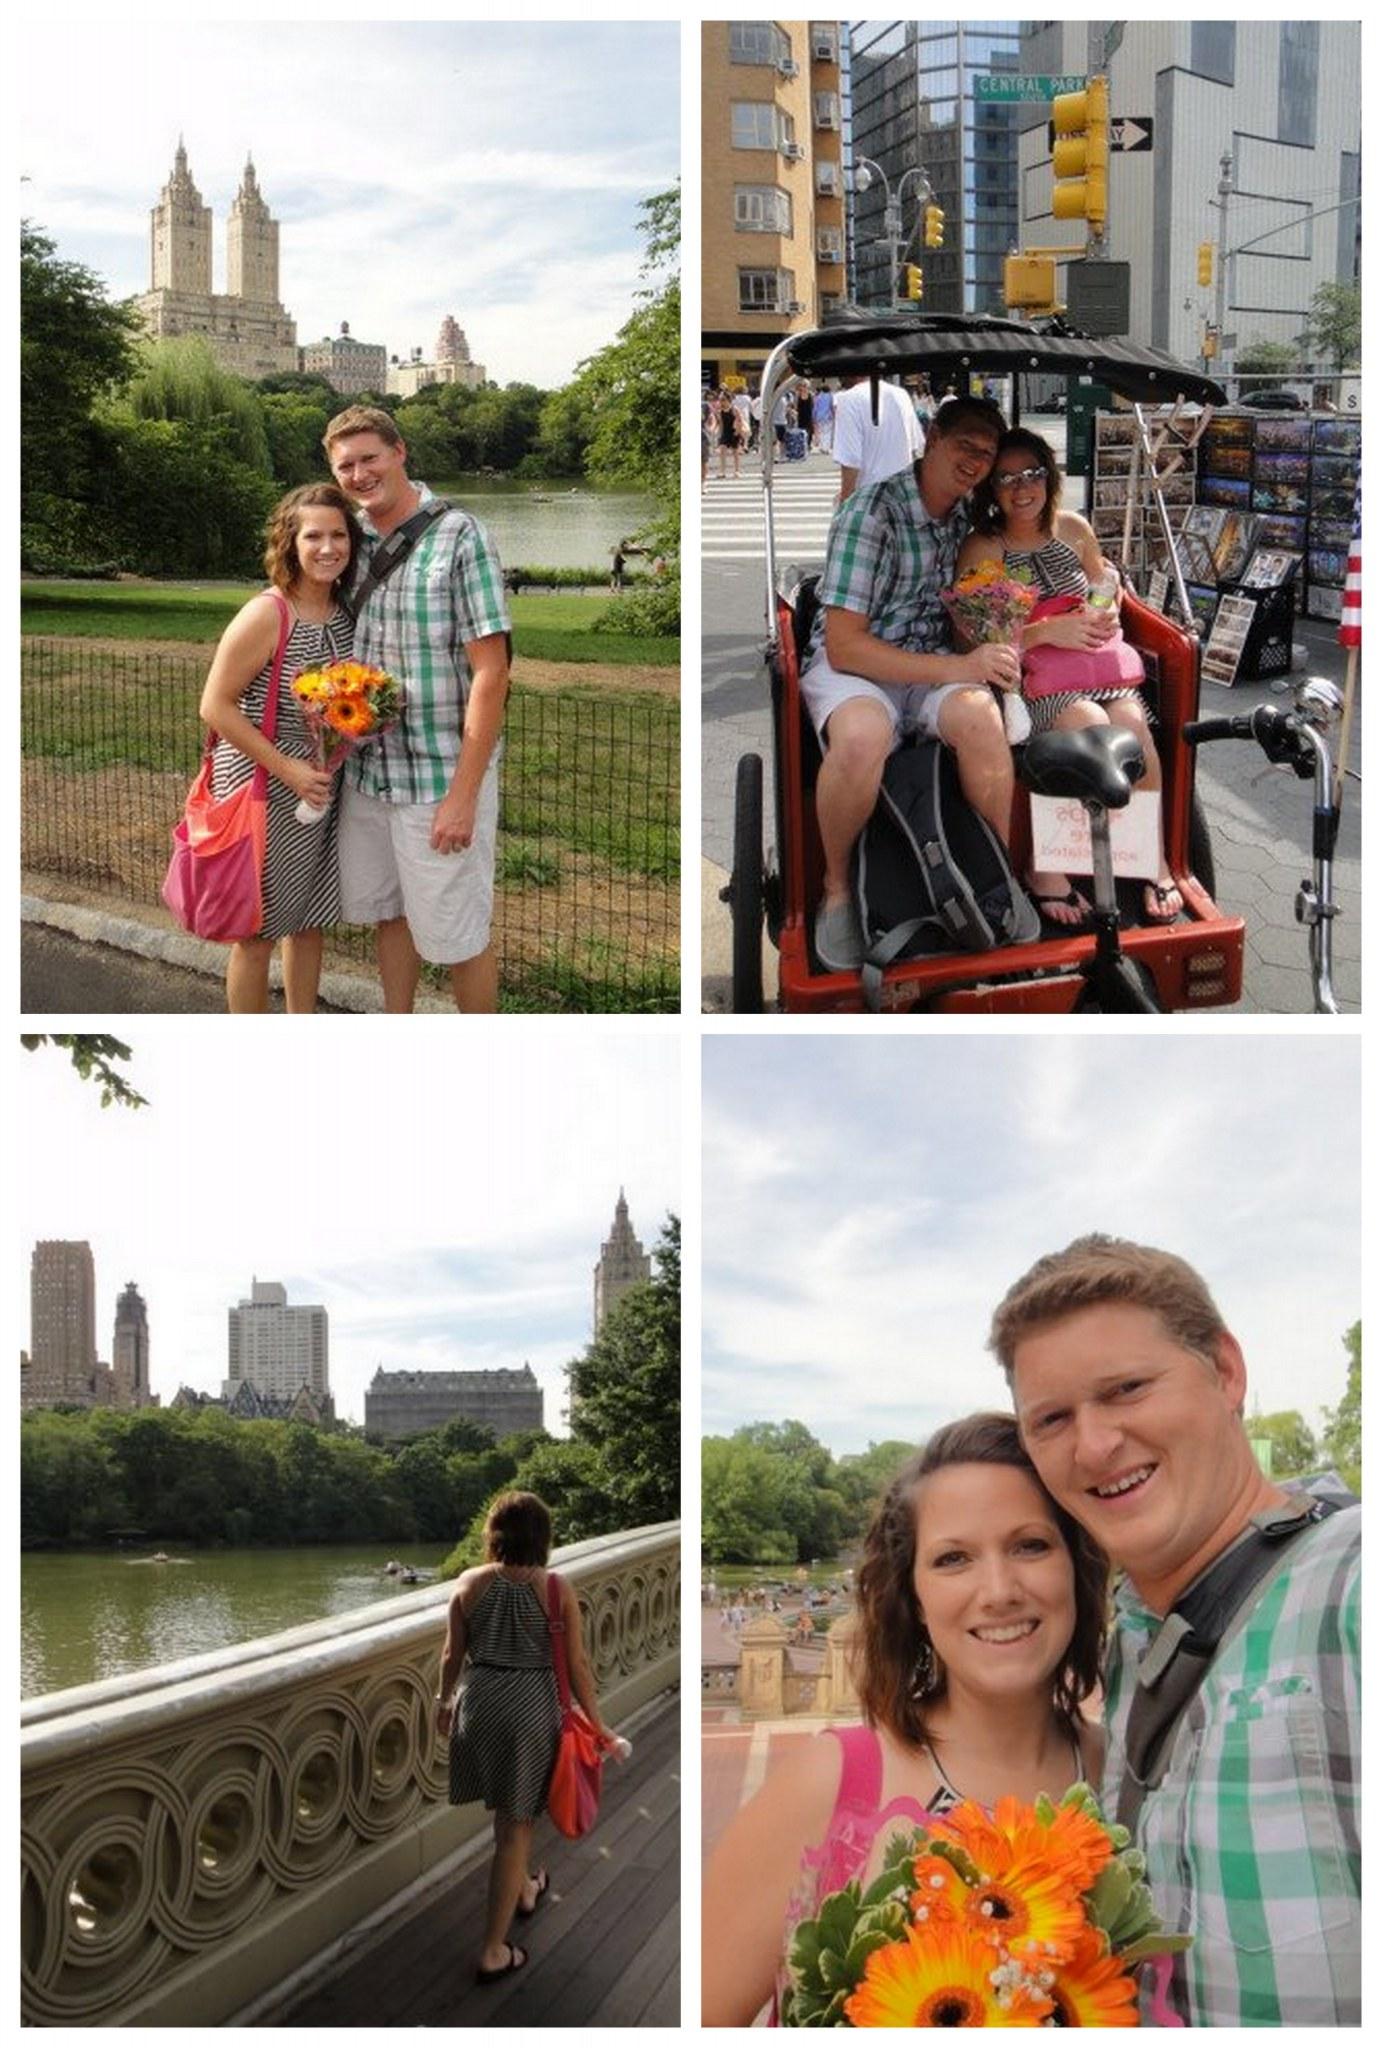 Go on a Central Park Pedicab Ride!